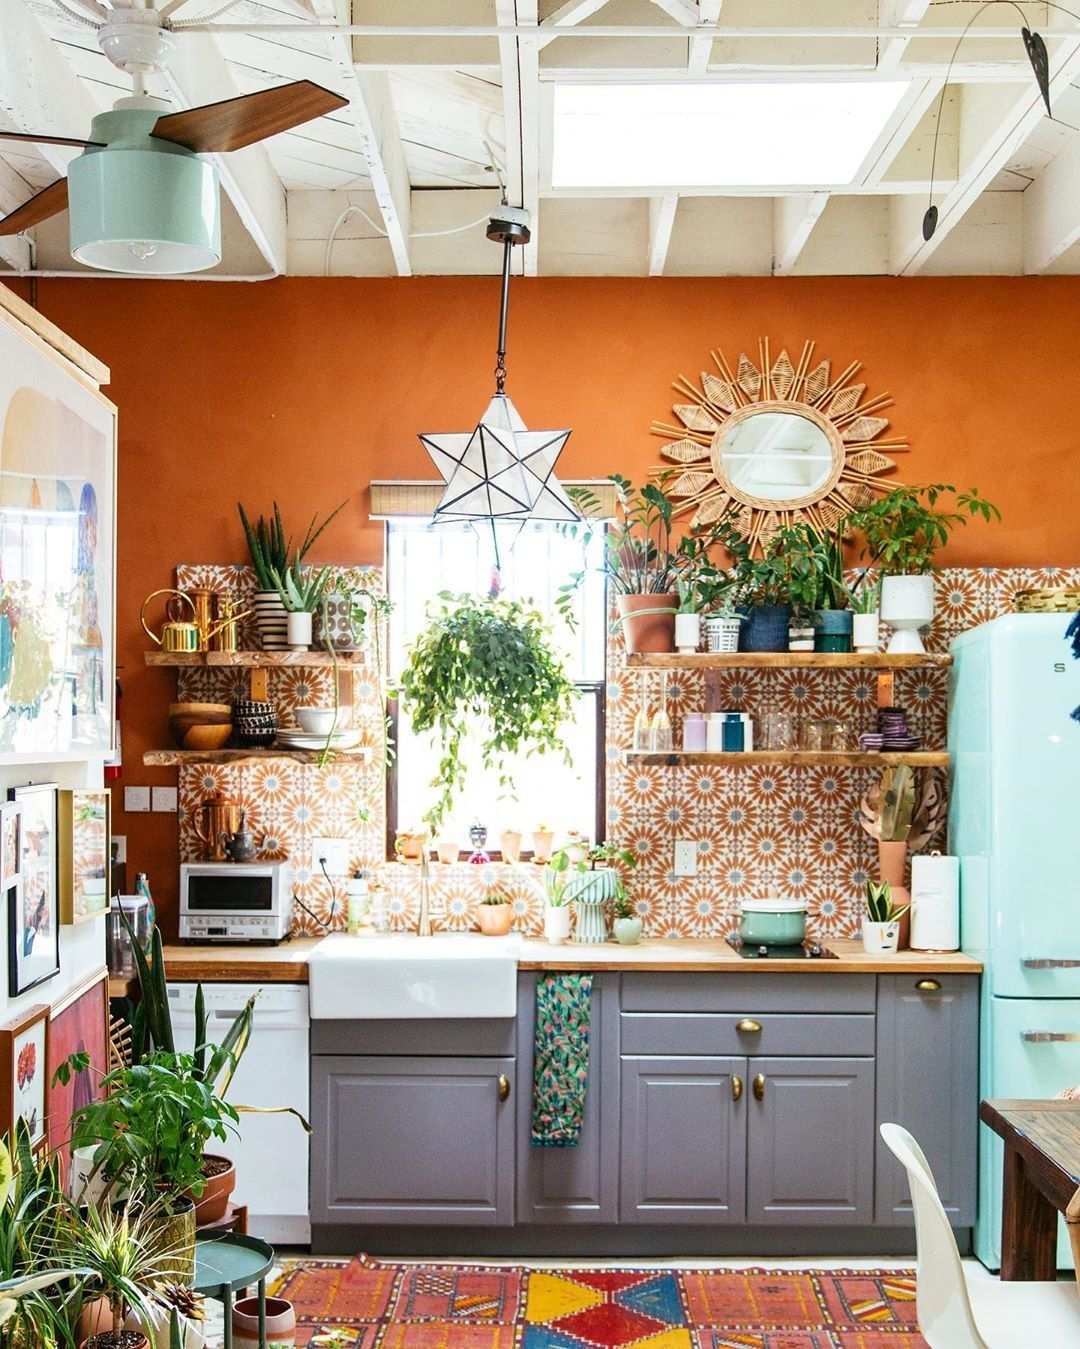 Boho Chic Kitchen Designs And Decor Ideas Bohemian Style Kitchen Bohemian Kitchen Interior Design Kitchen